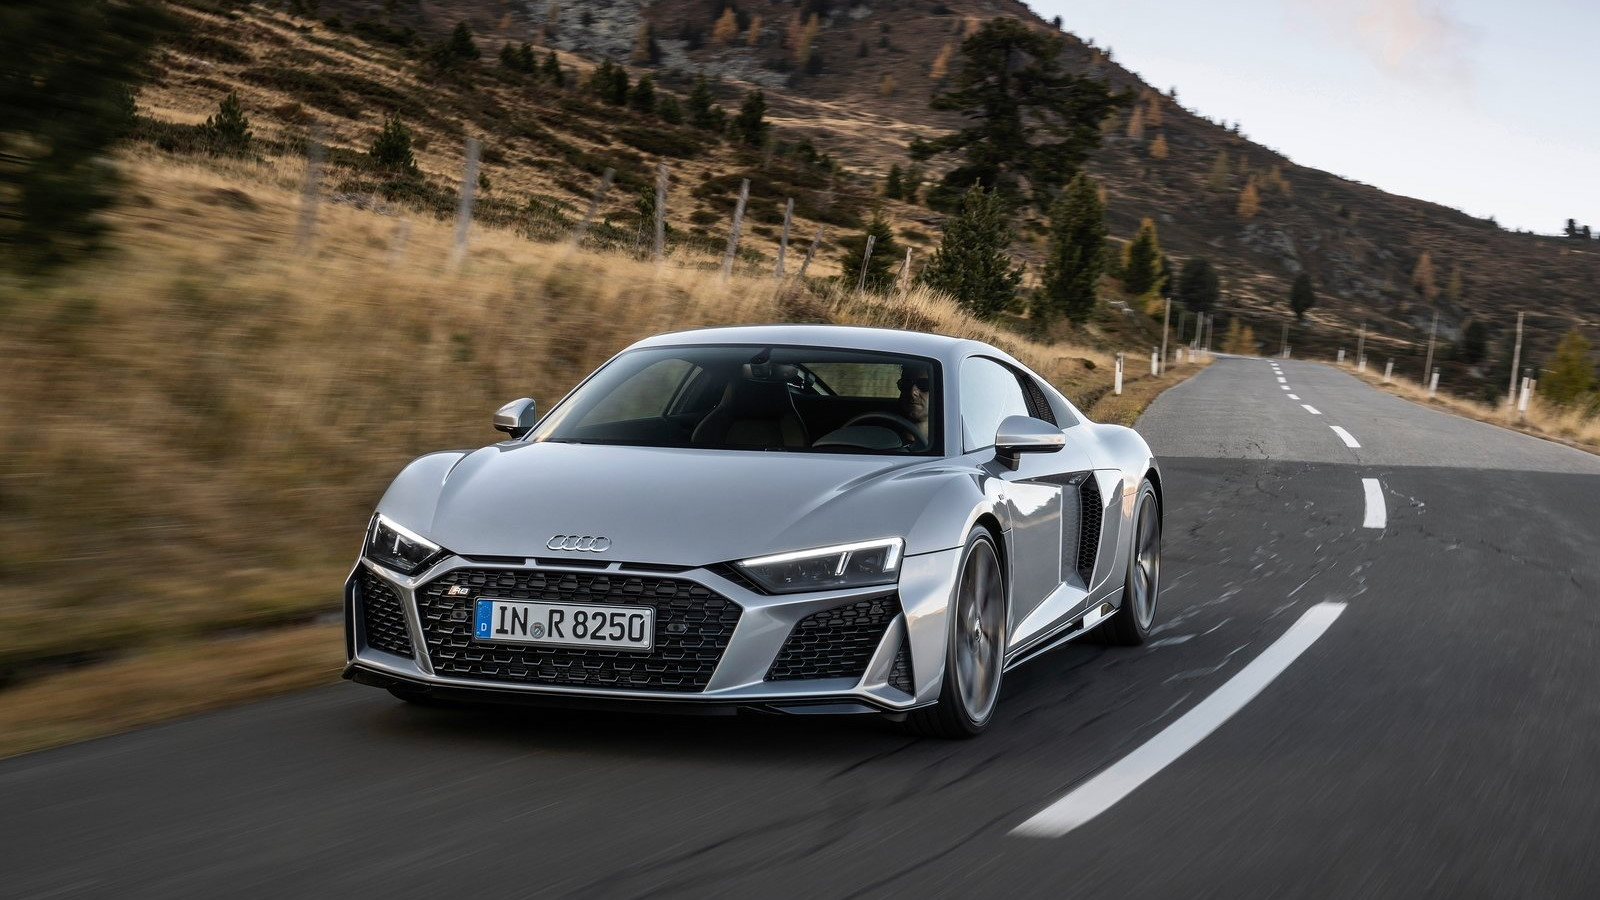 Audi-R8_V10_RWD-2020-1600-07